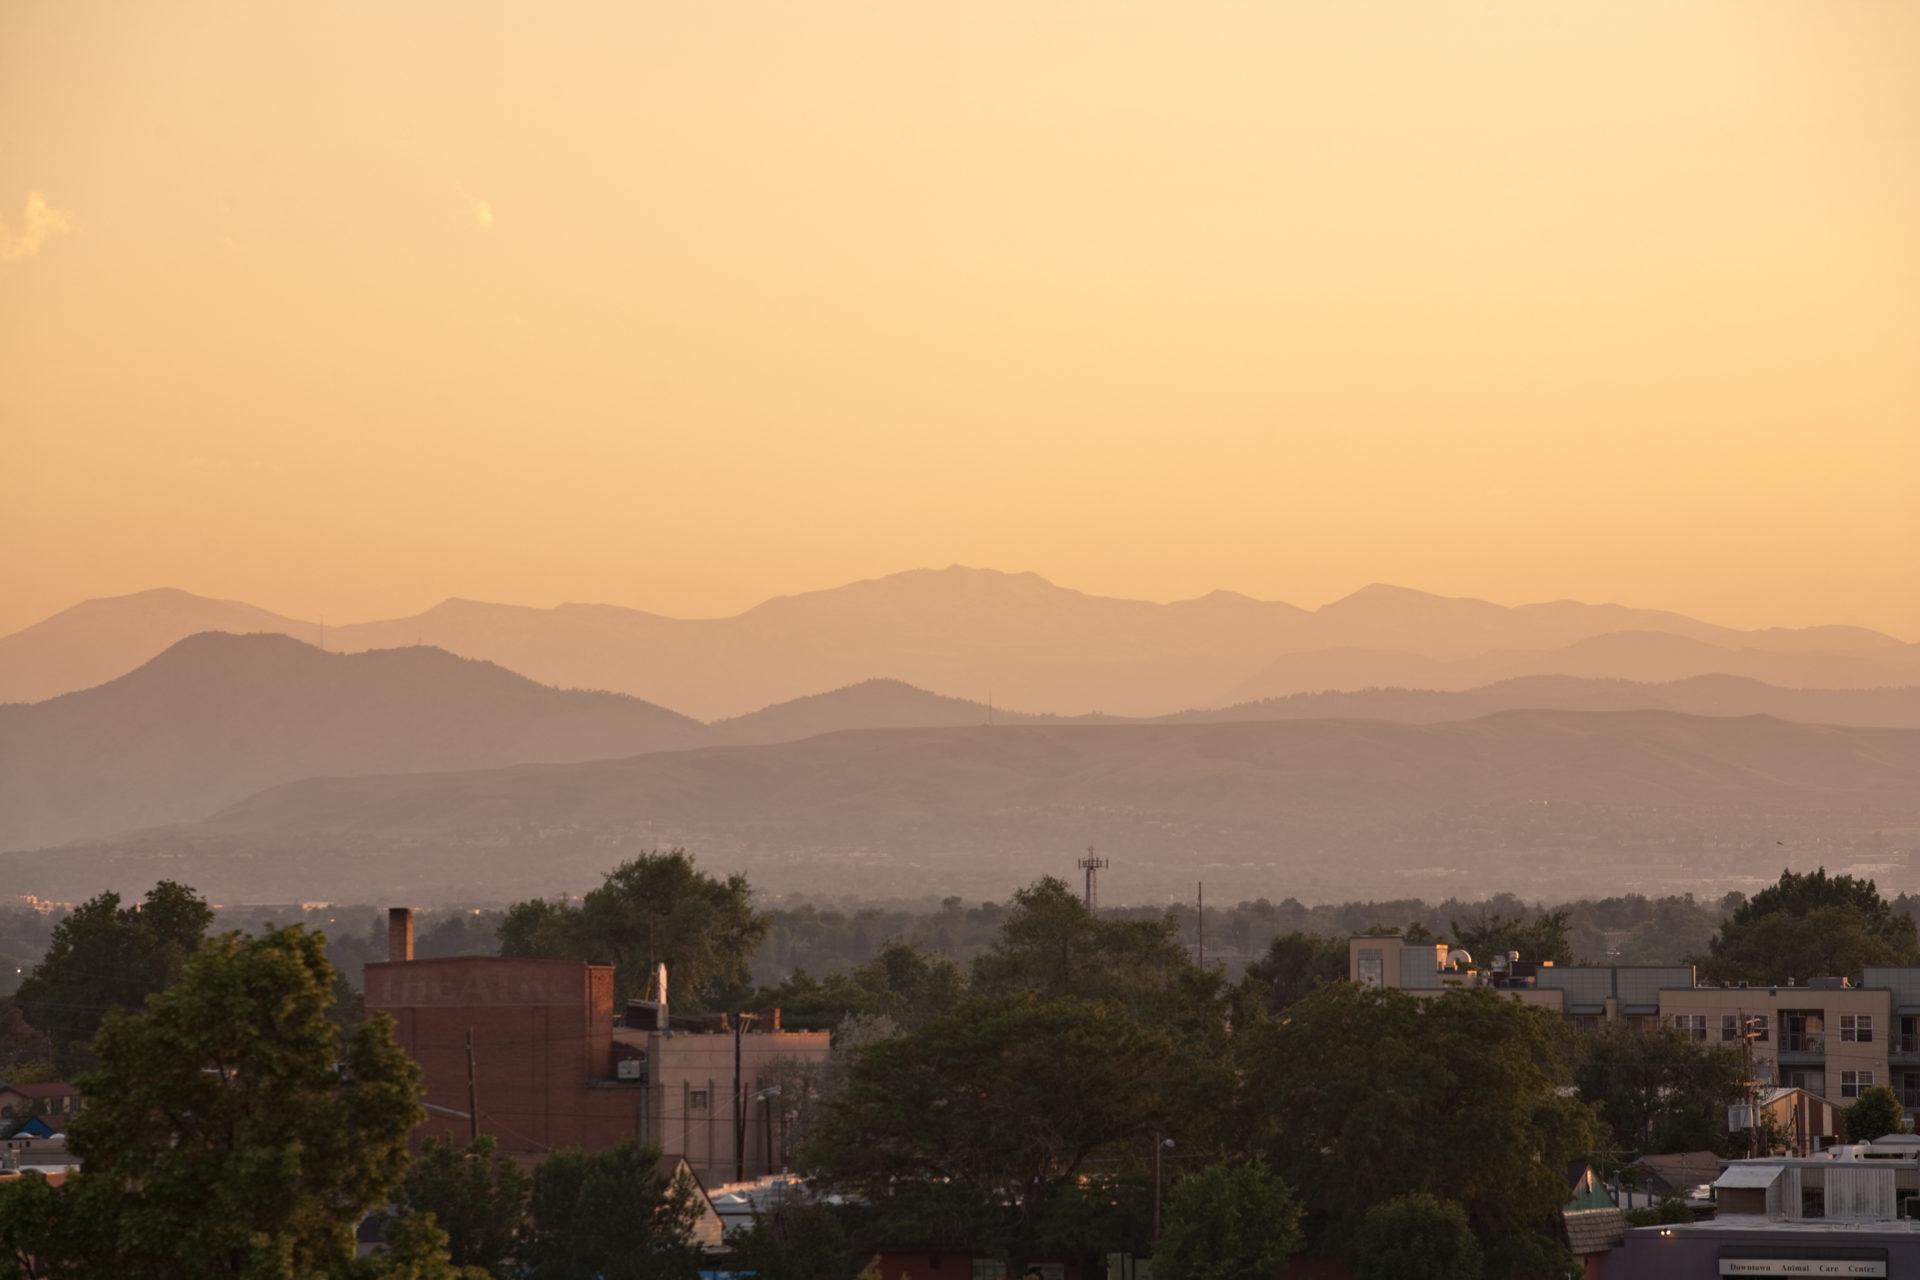 Mount Evans sunset - June 11, 2011